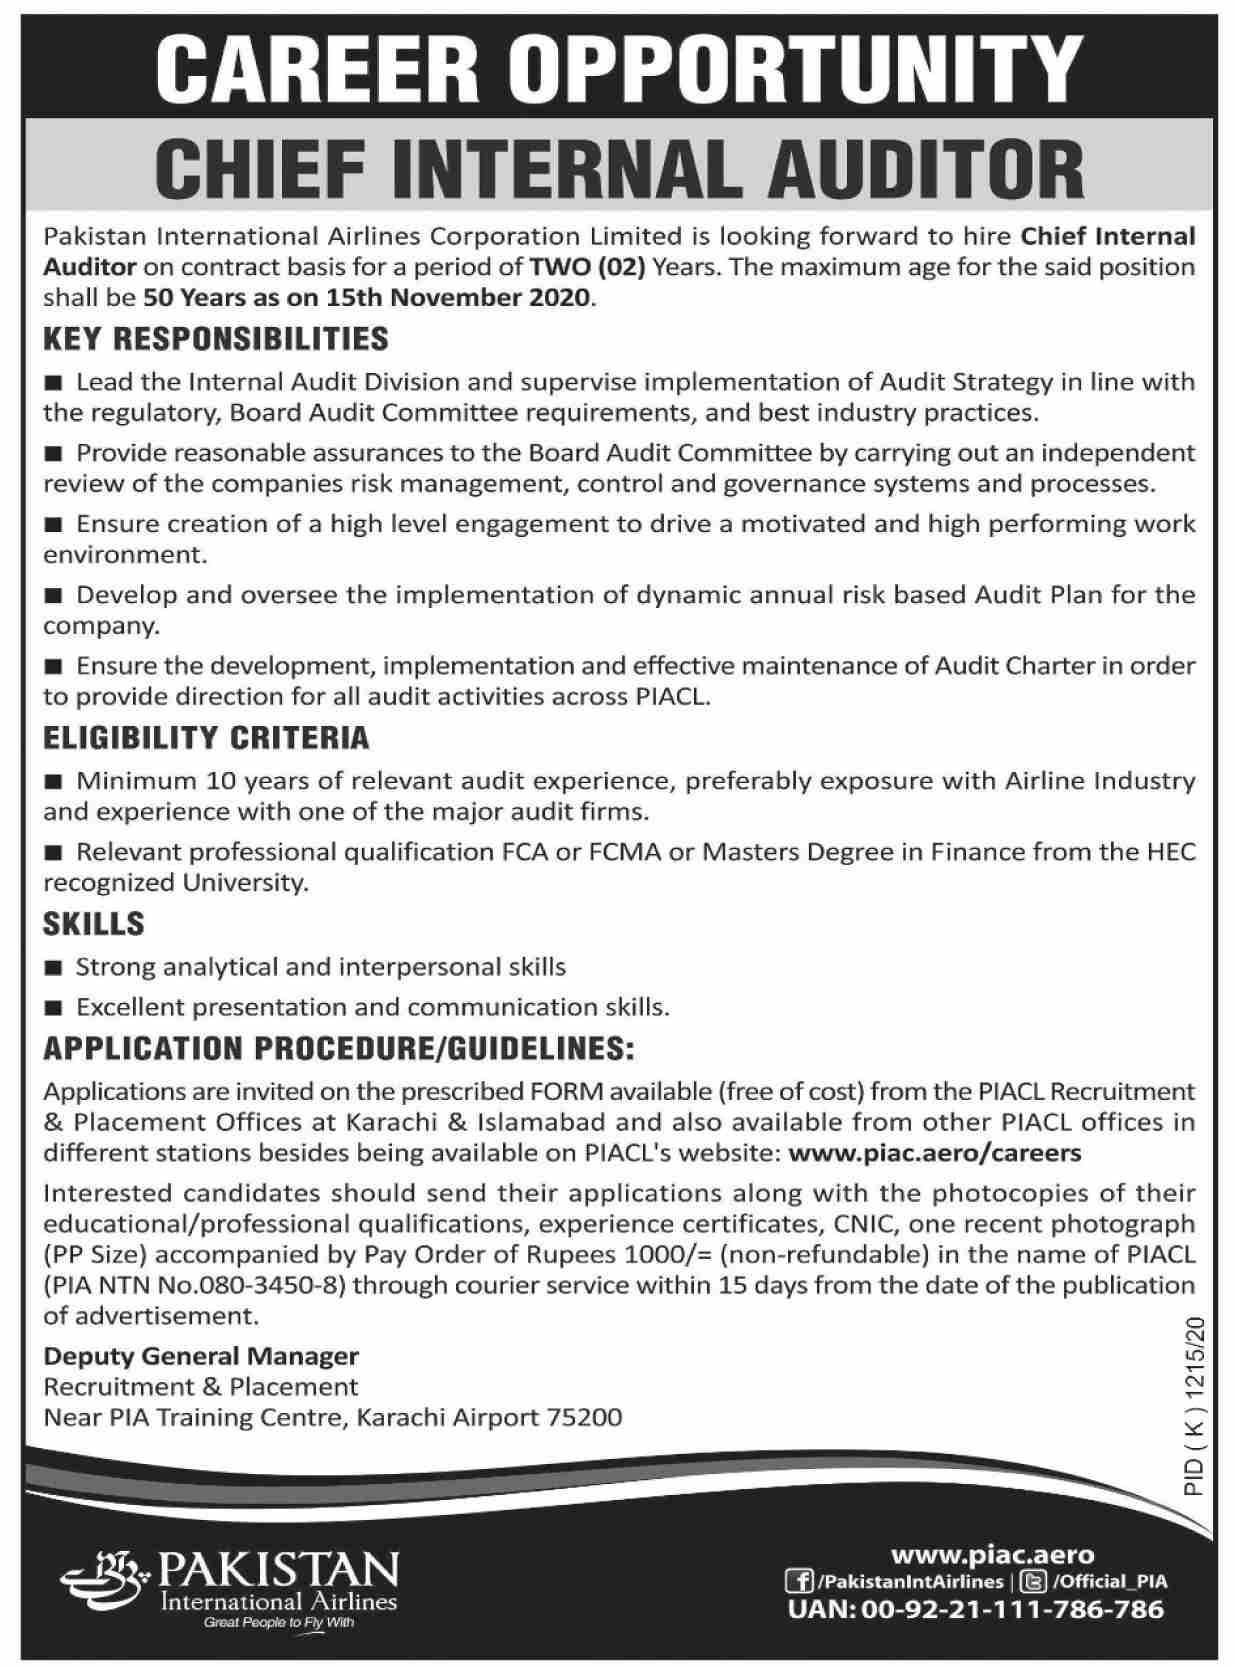 Pakistan International Airlines PIA Latest Jobs in Pakistan - Online Apply - www.piac.aero/careers